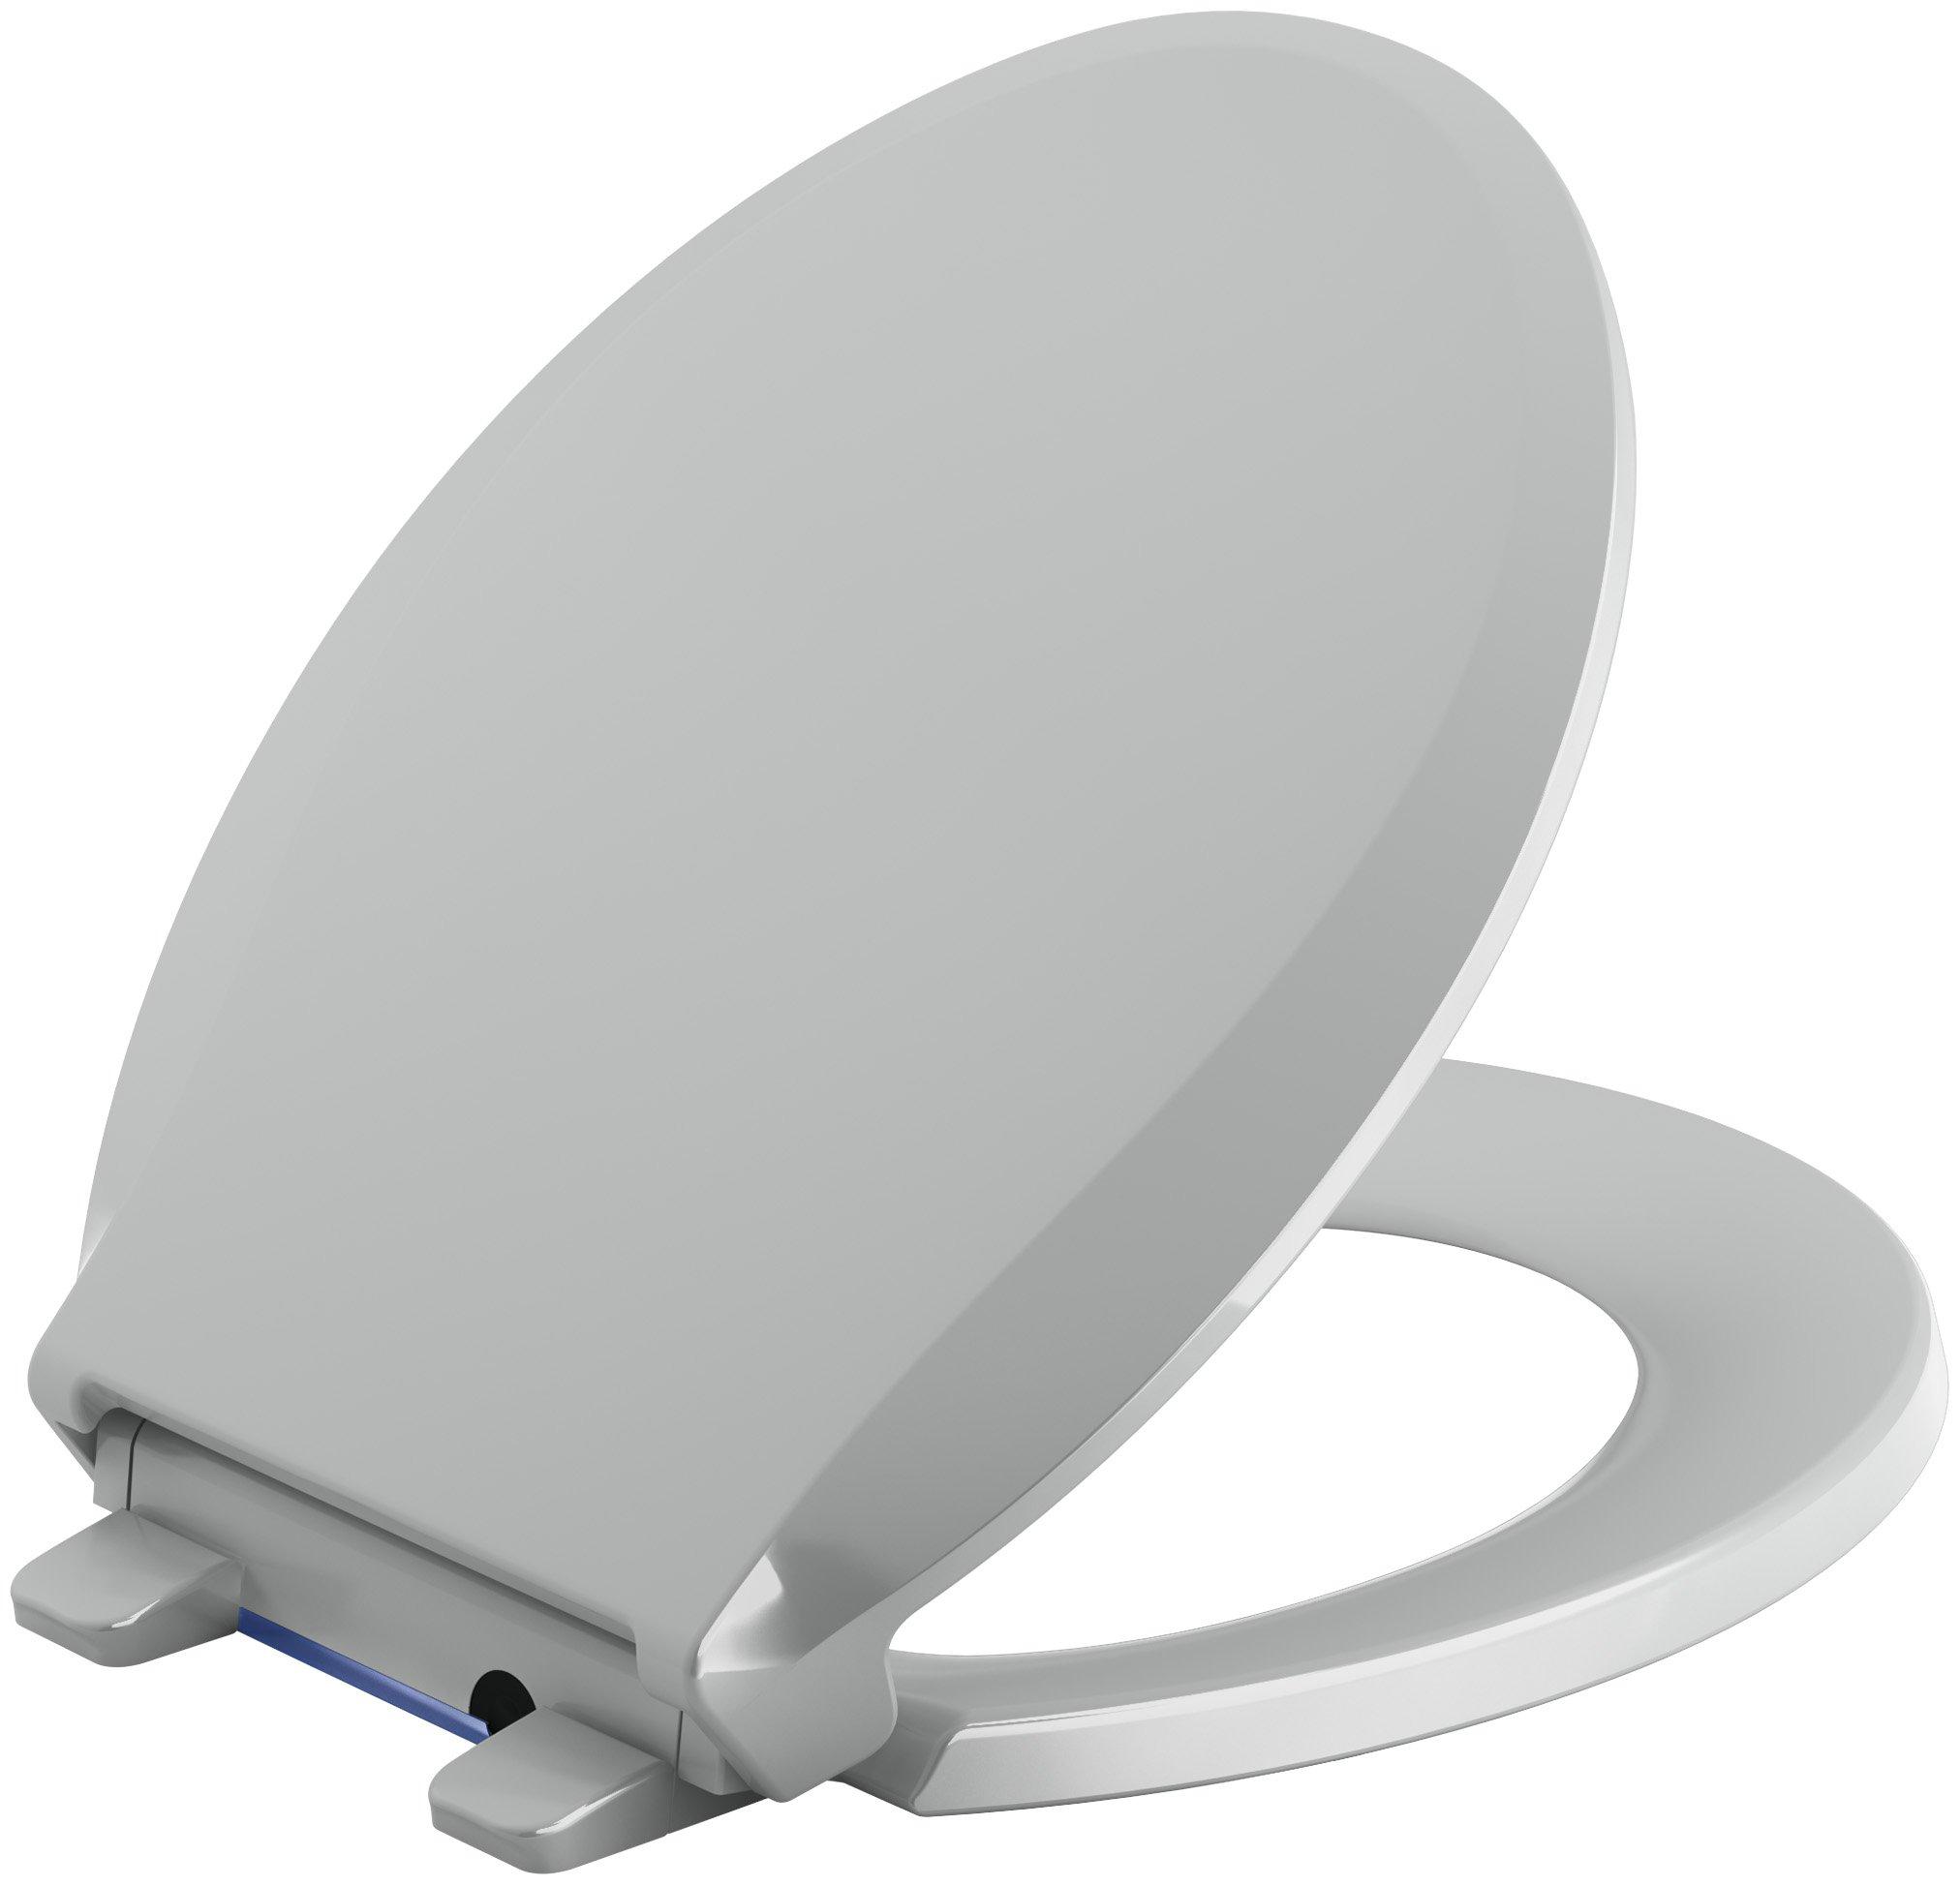 KOHLER K-75758-95 Cachet Toilet Seat, Round, Ice Grey